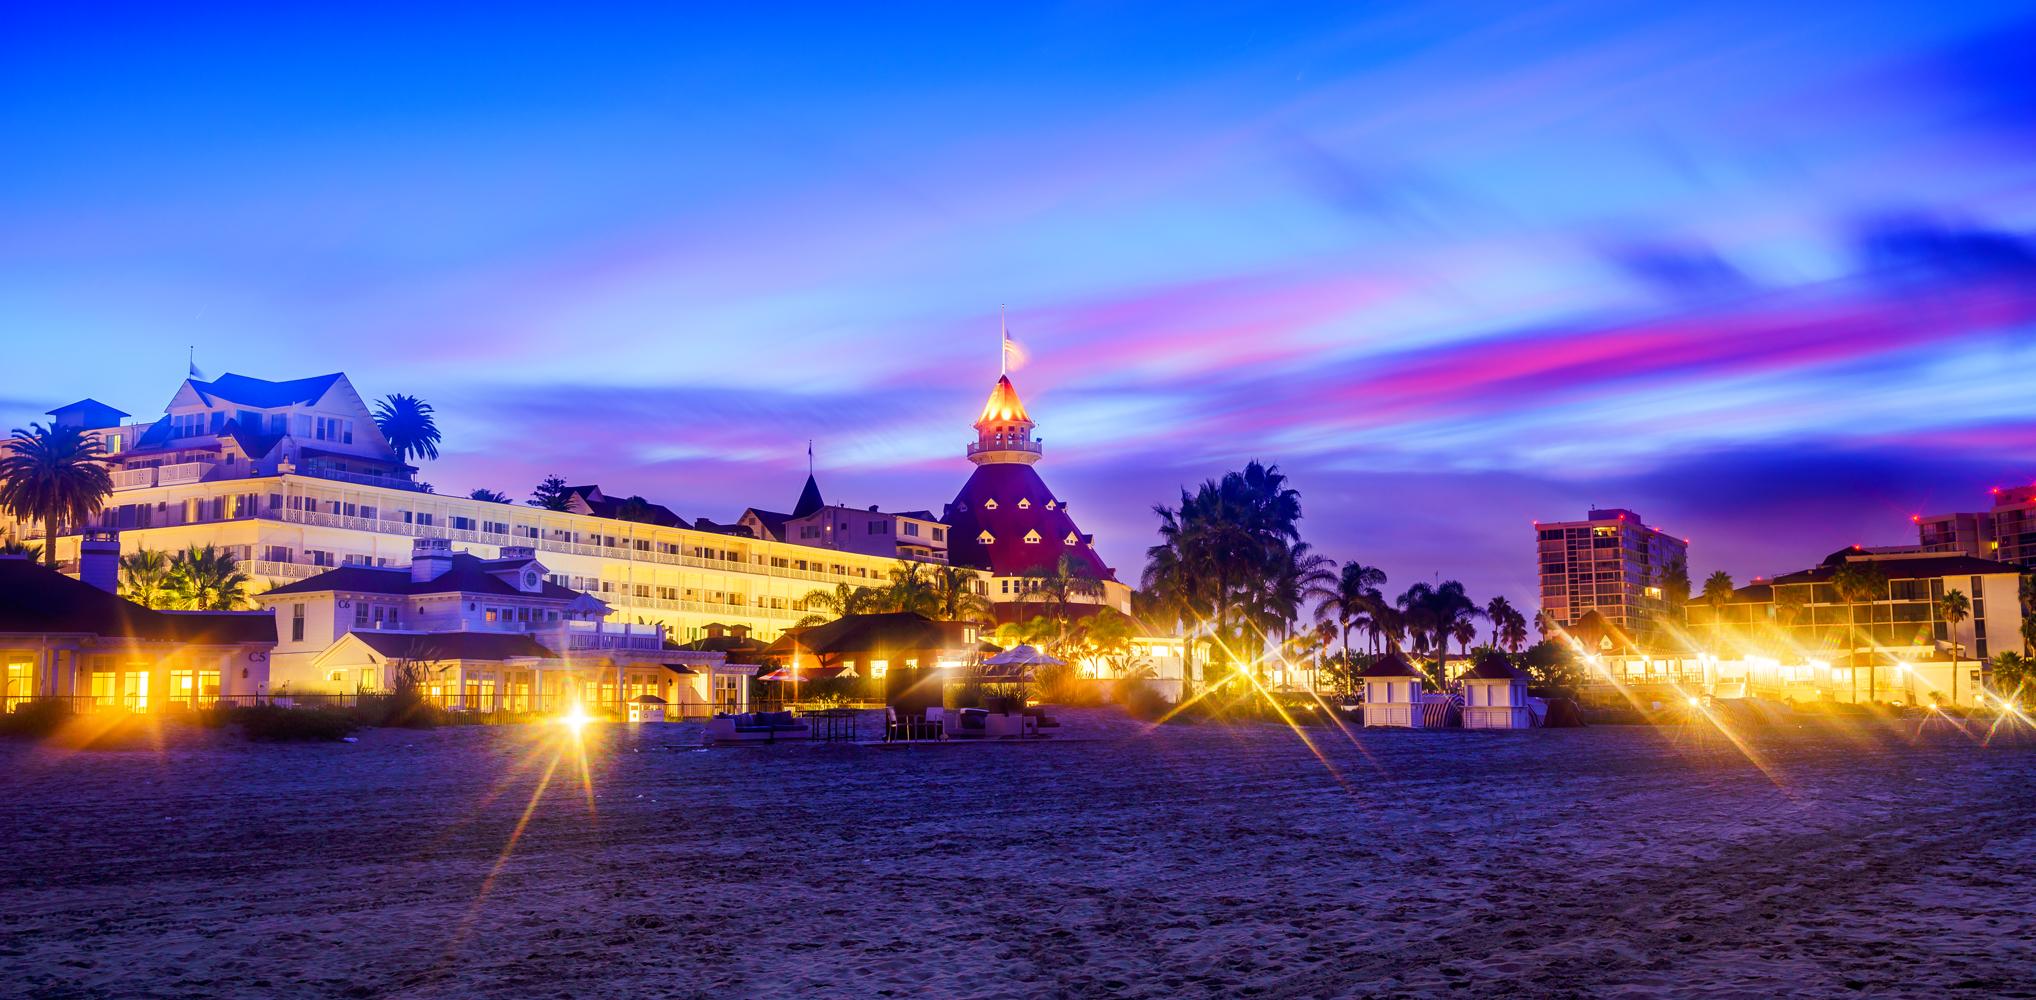 Sunrise Hotel Del2 2016-10-31